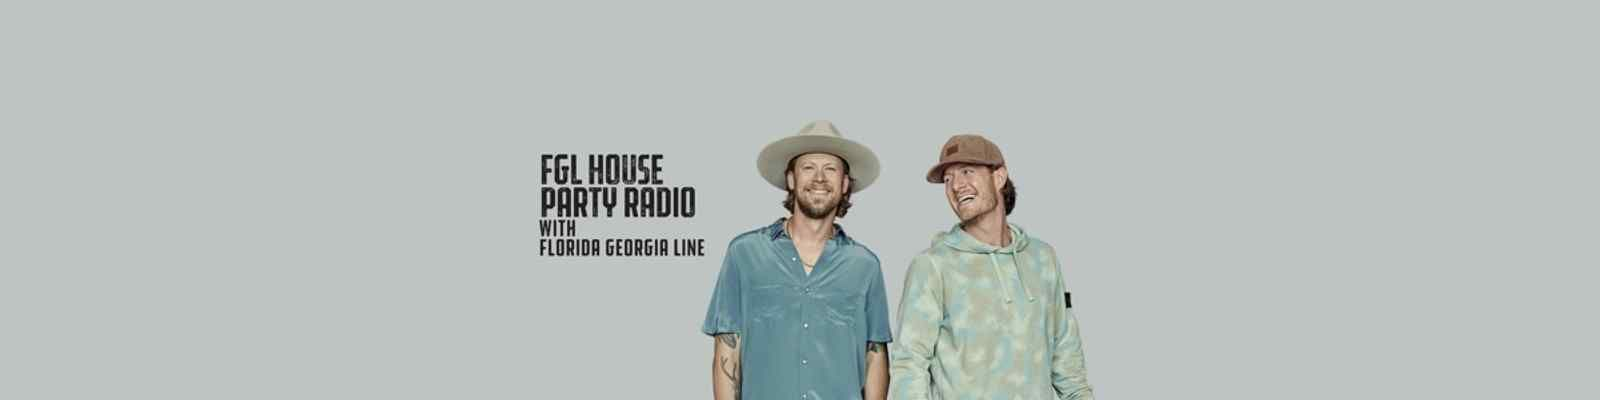 FGL House Party Radio with Florida Georgia Line